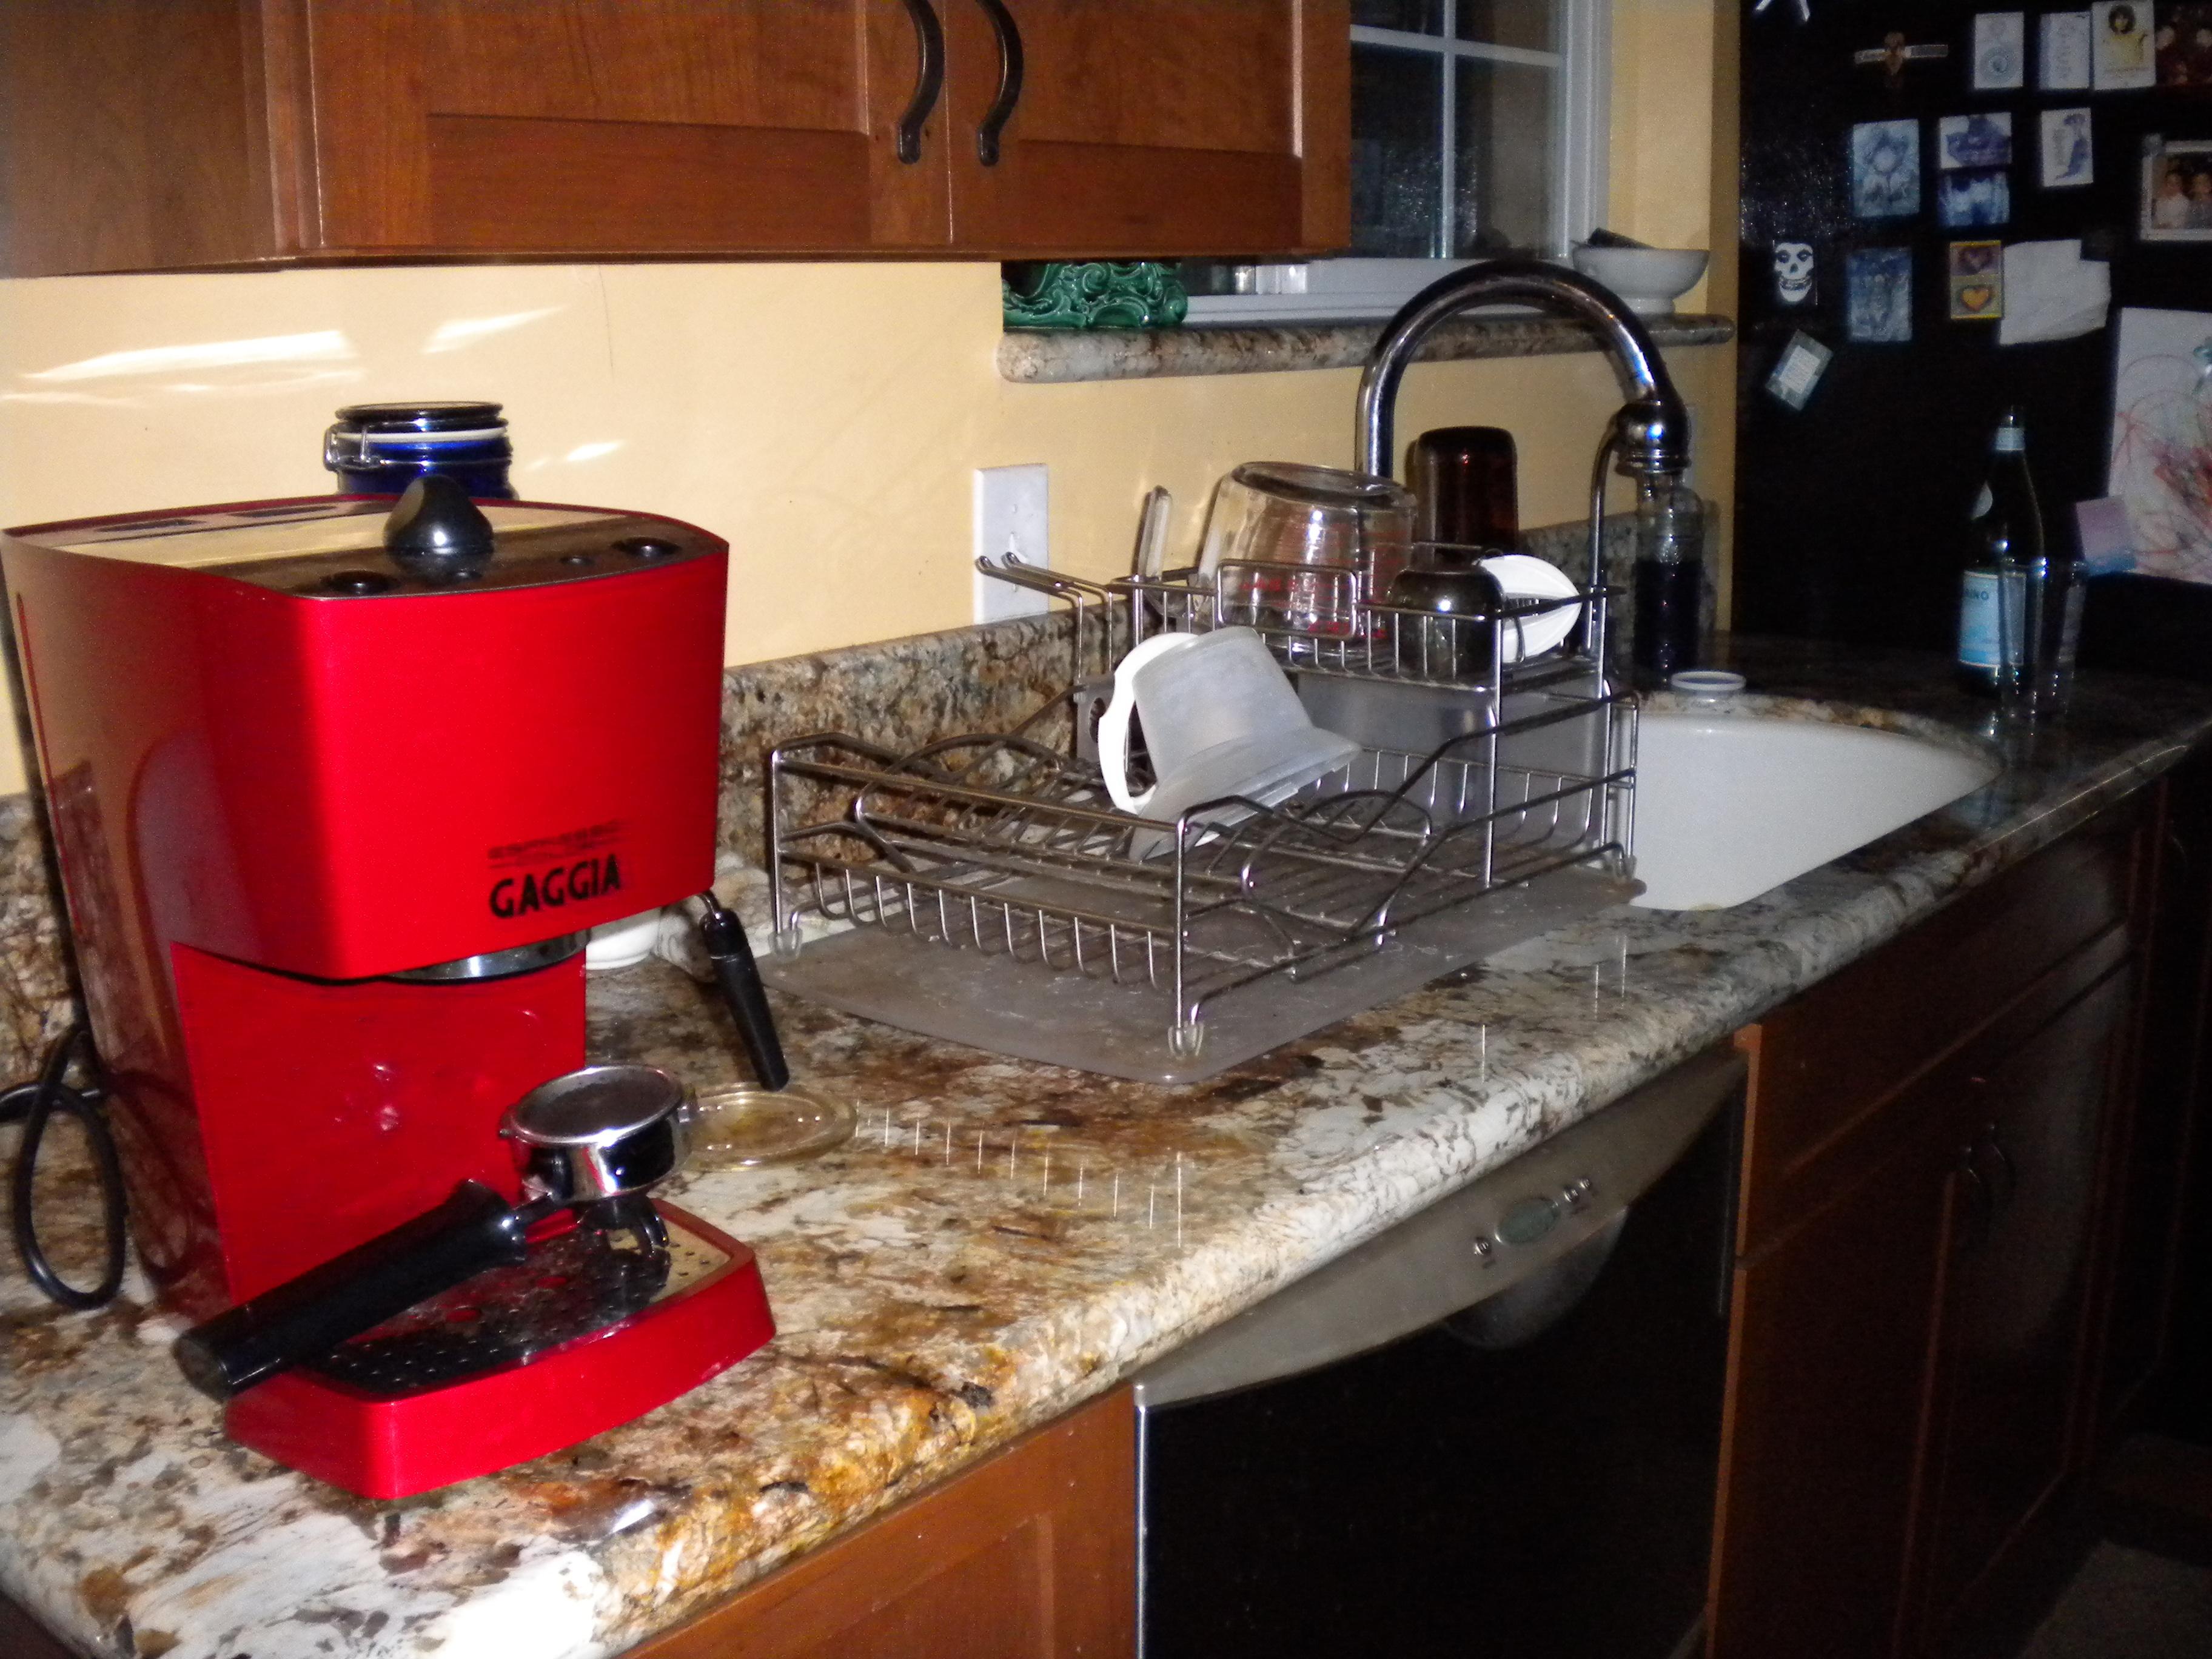 The red cappuccino machine